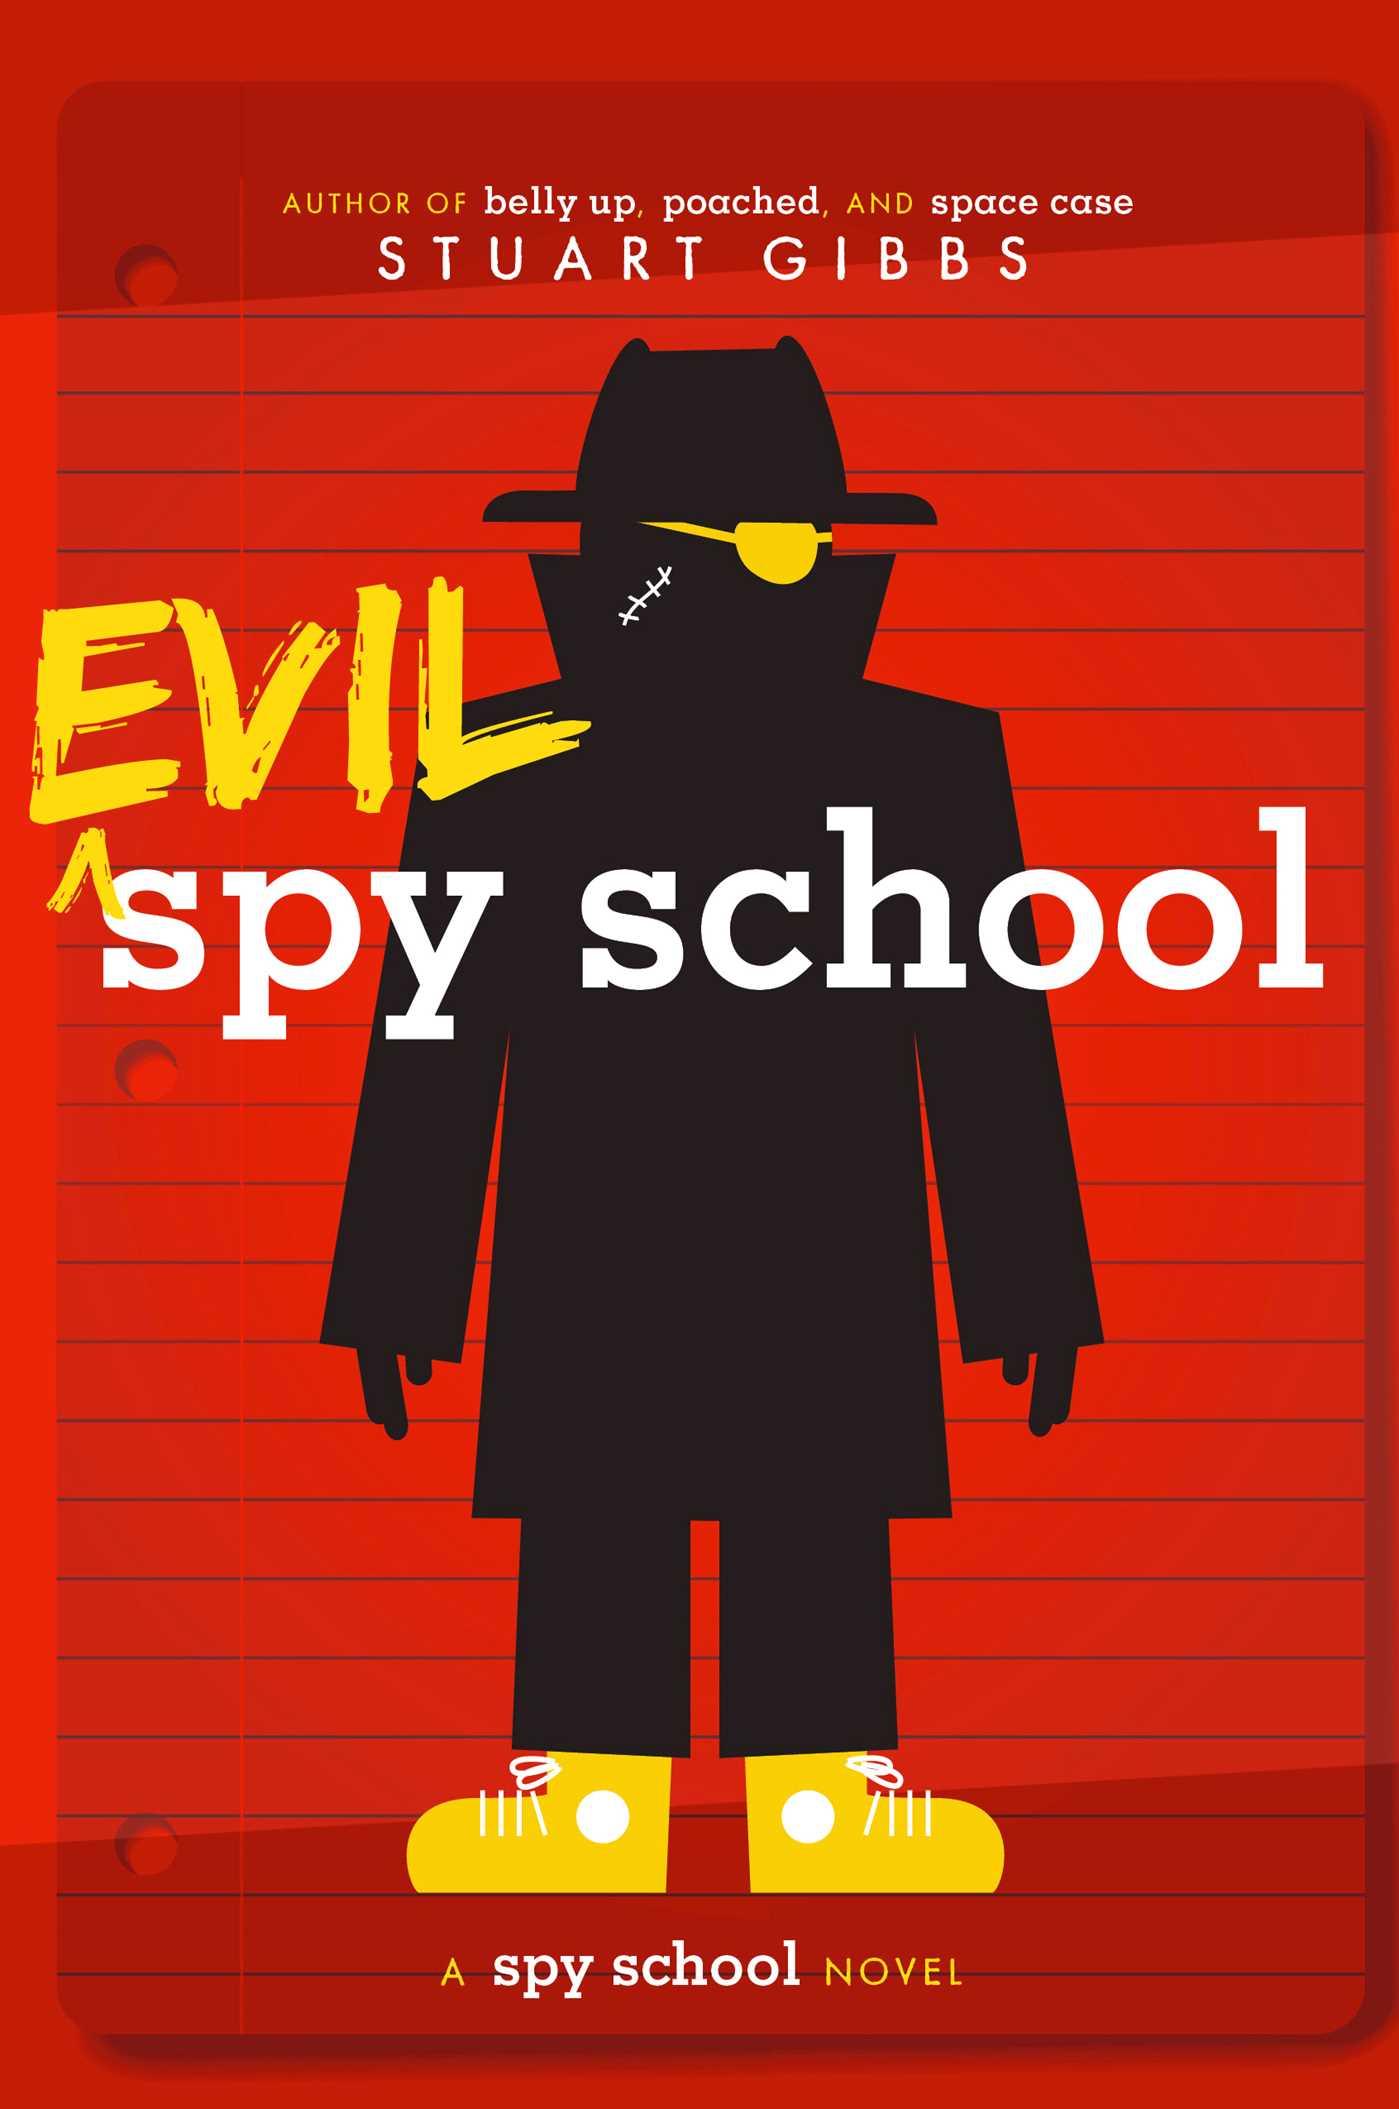 gibbs-evil-spy-school.jpg